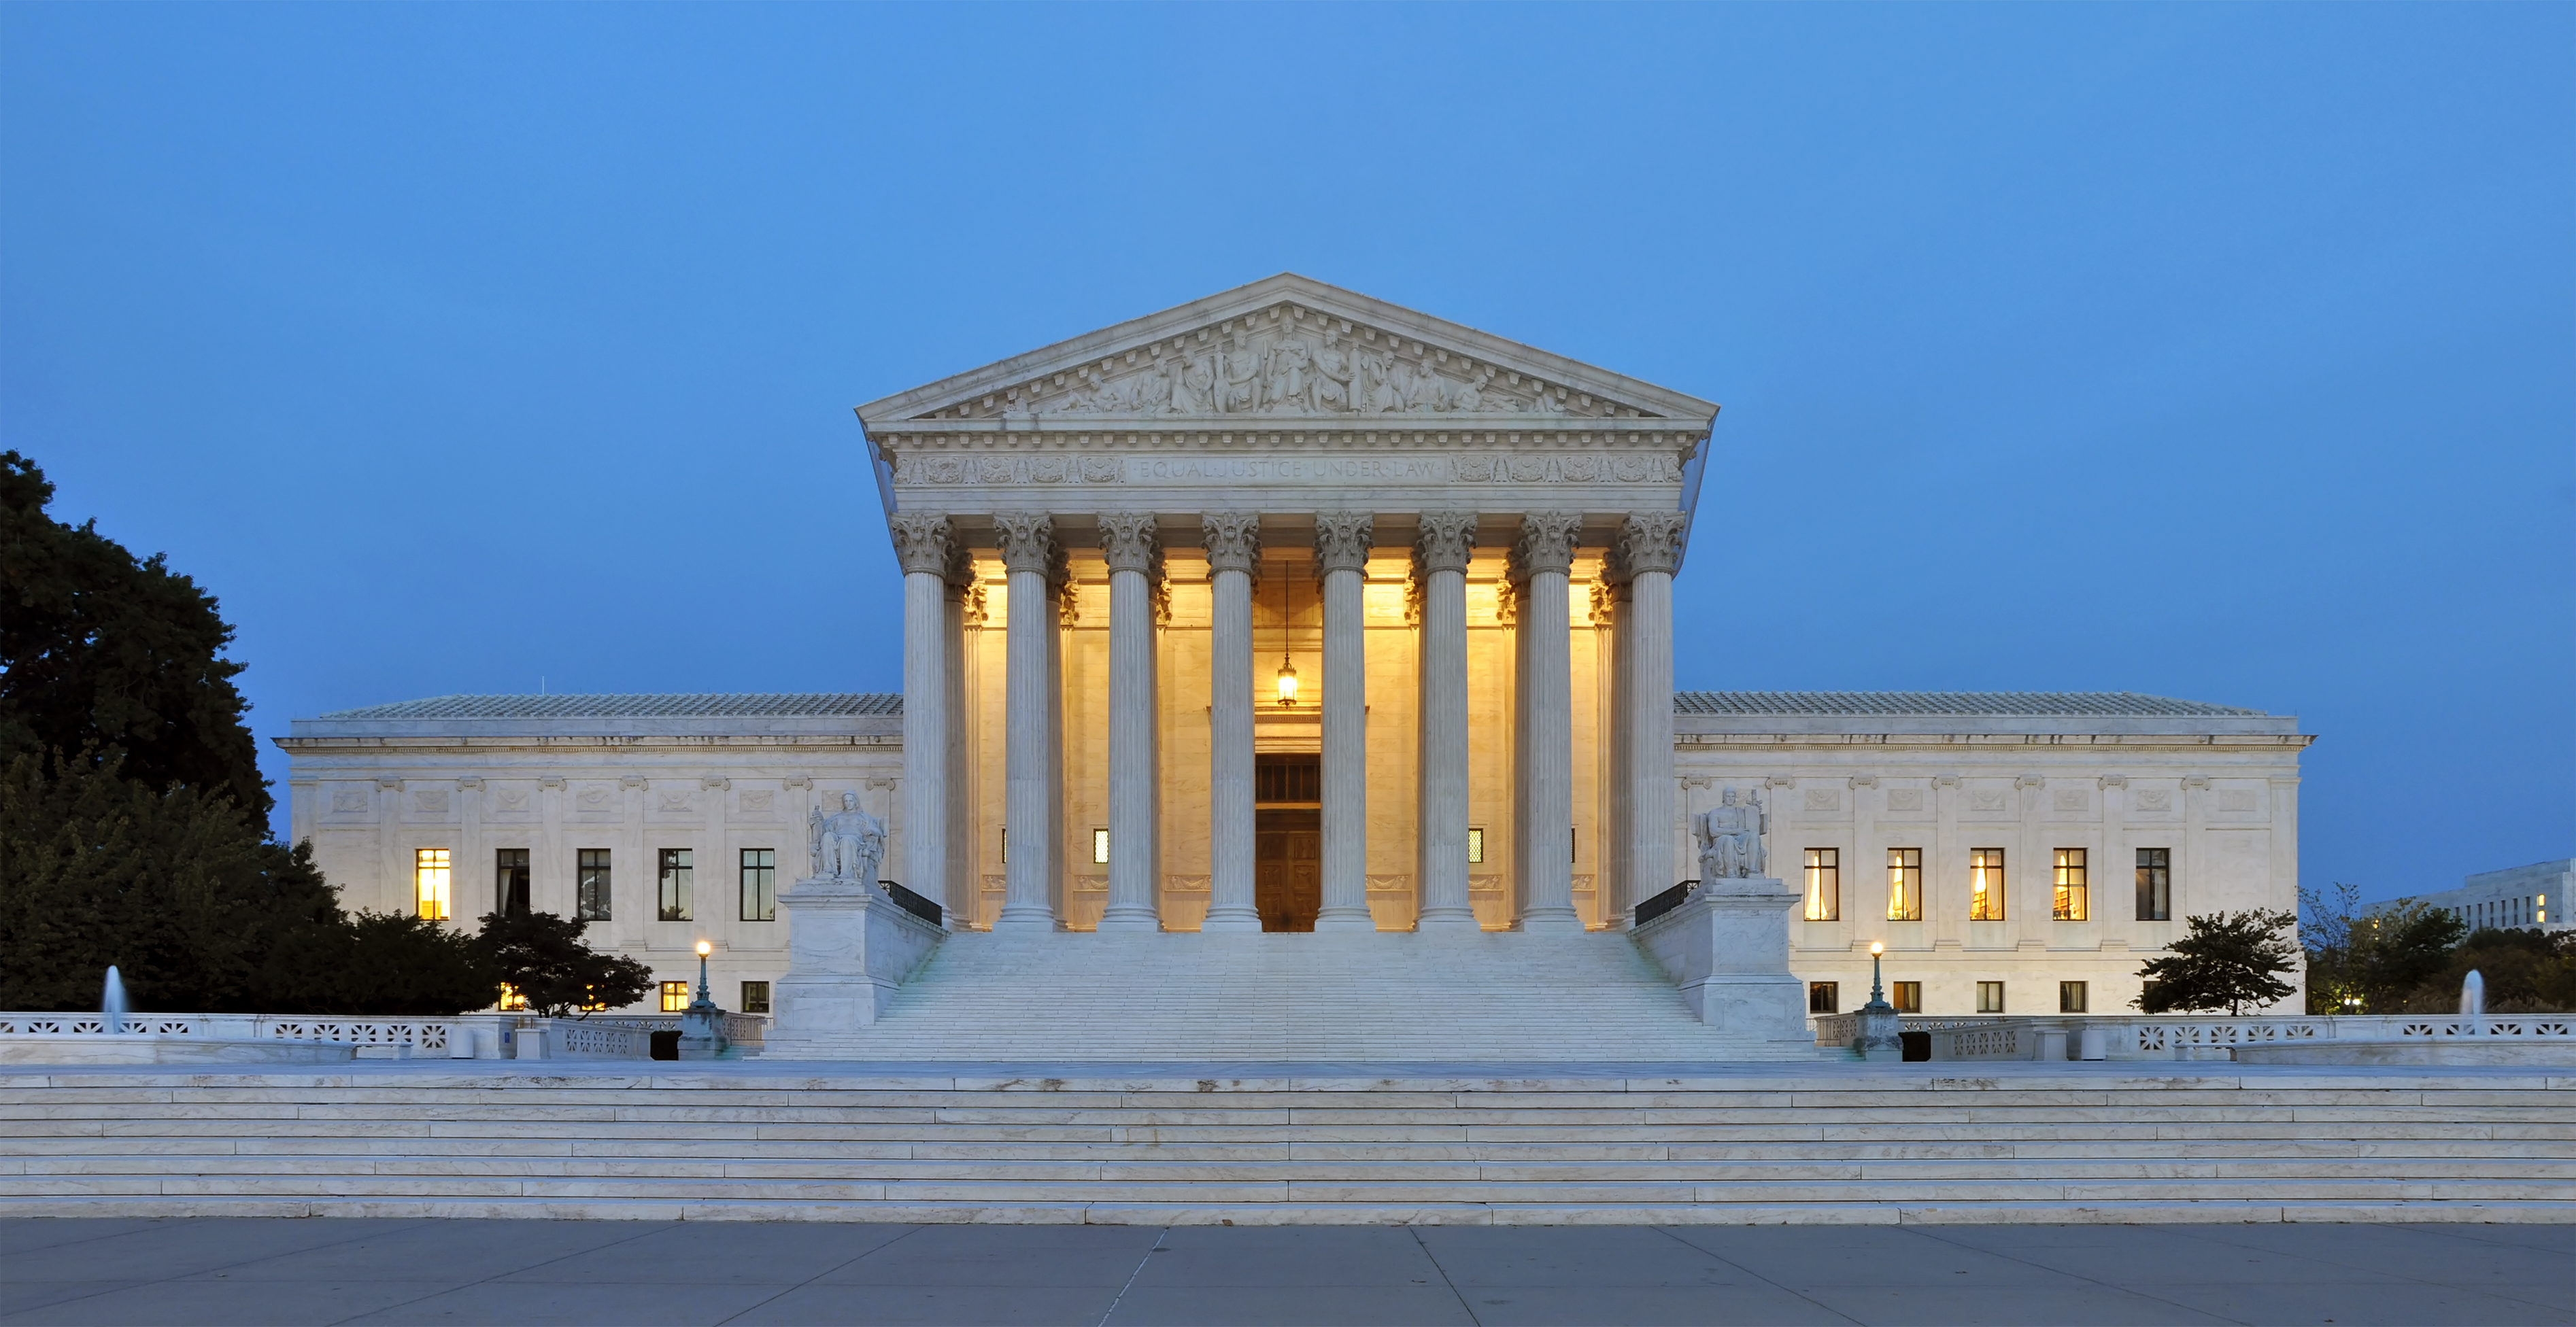 Writing a supreme court opinion